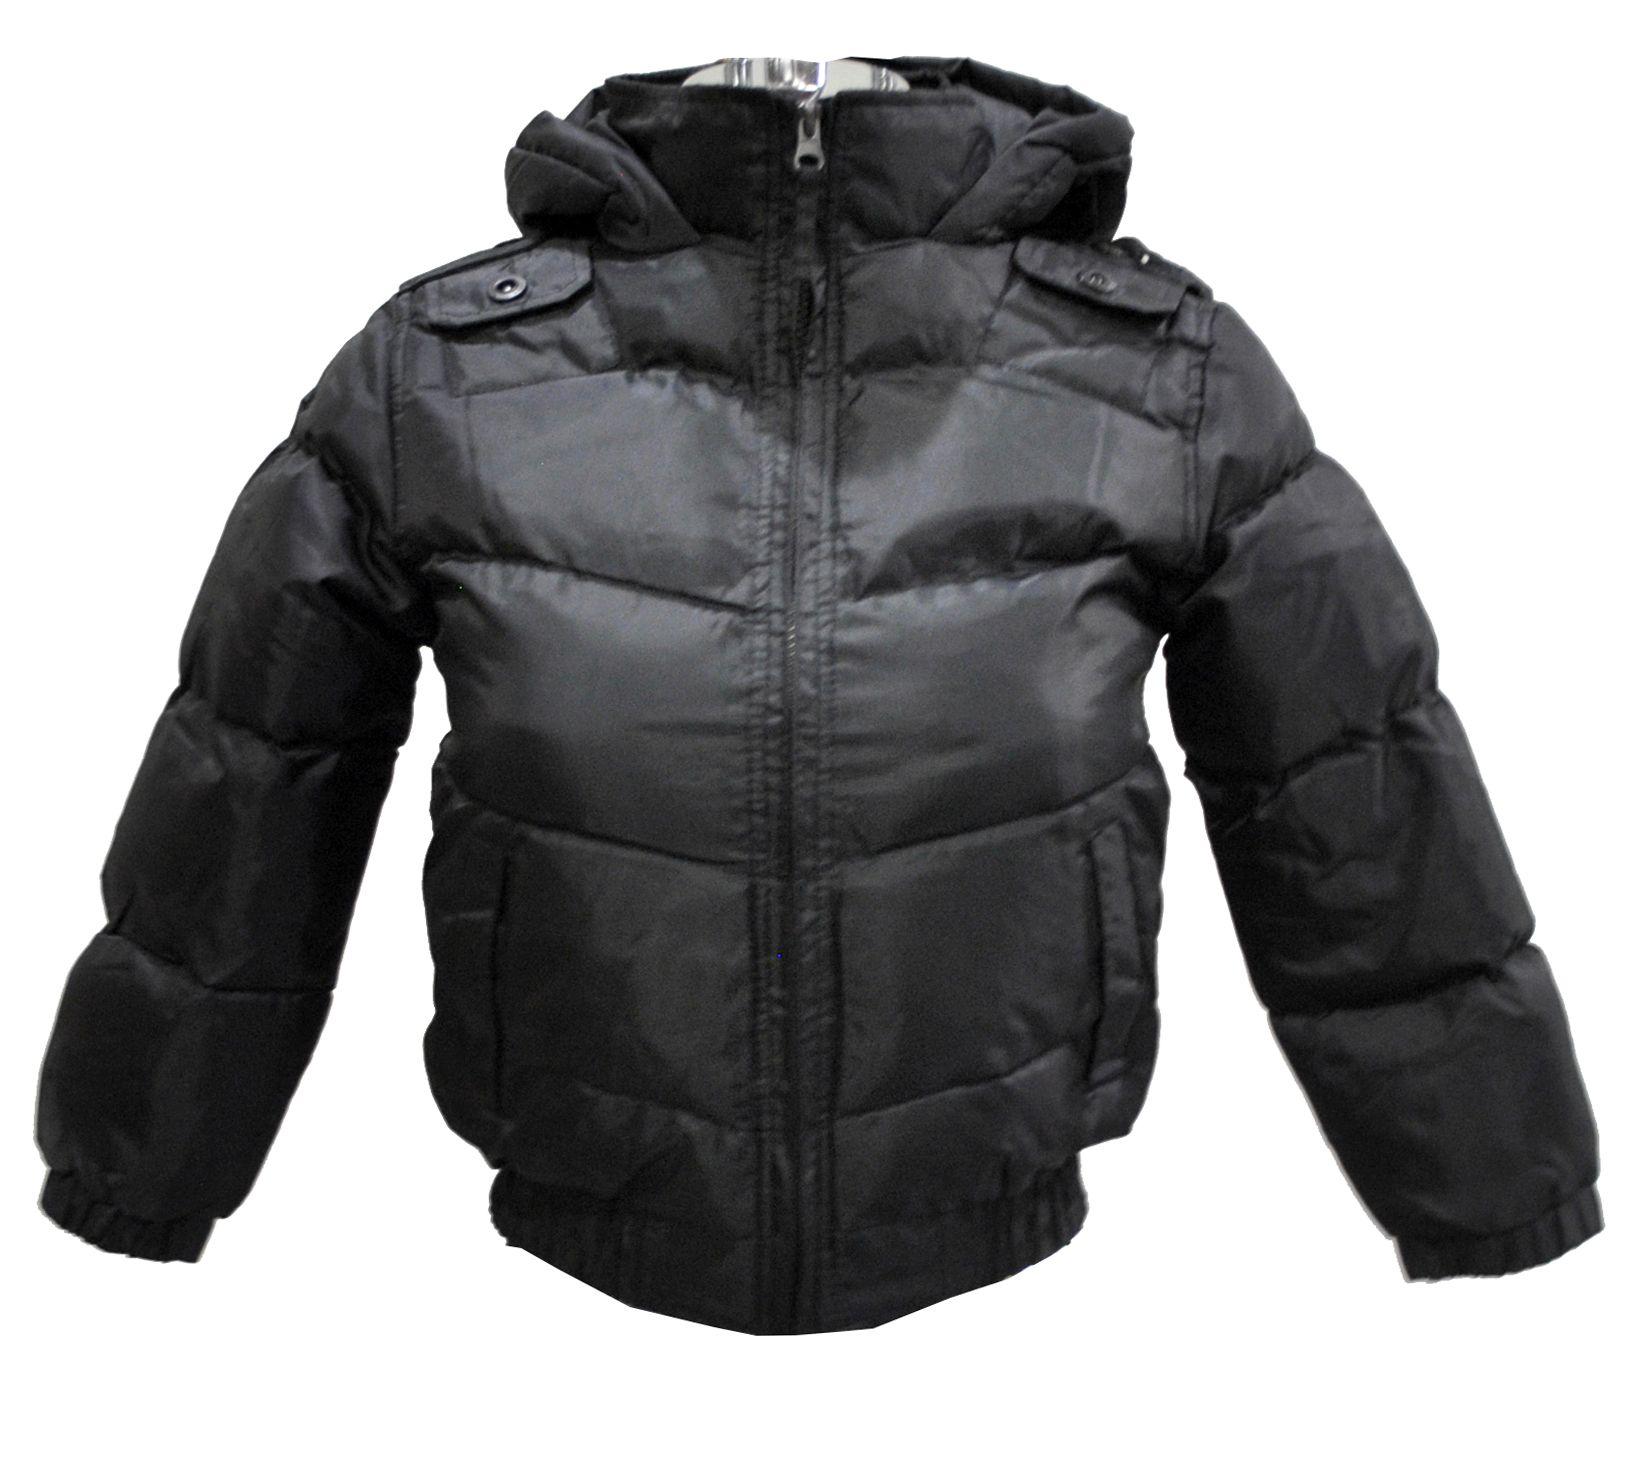 younger-boys-black-bomber-jacket-extra-warm-2991-p.jpg